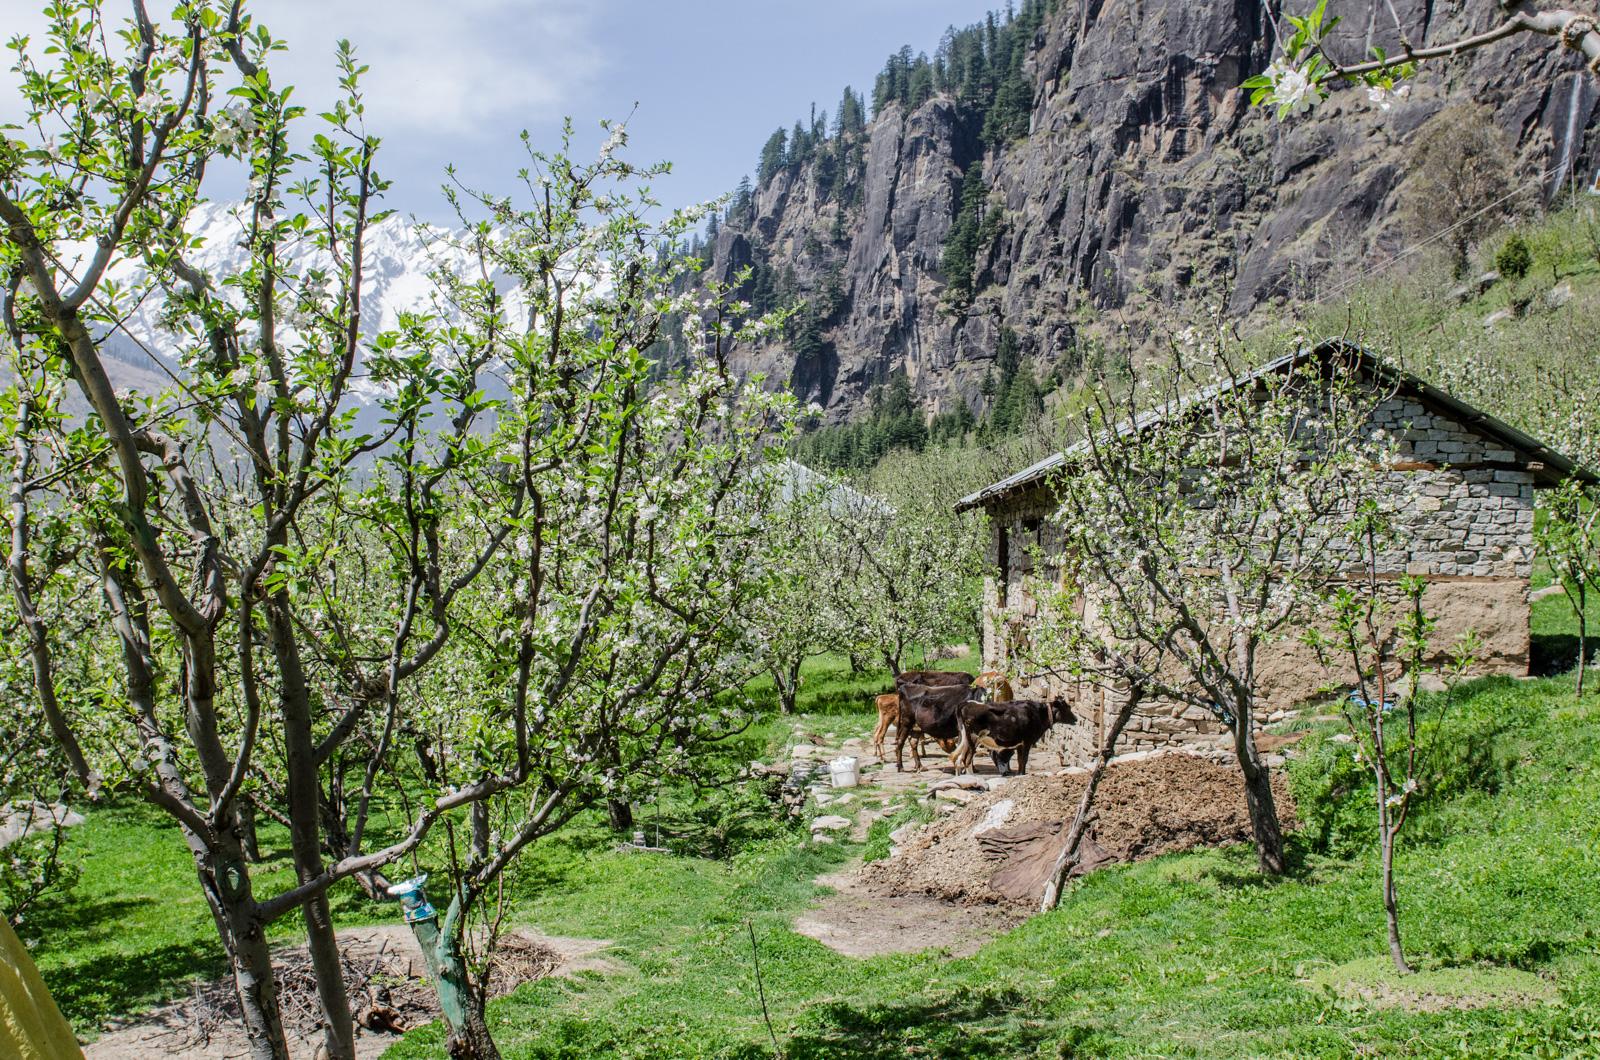 Manali-HimachalPradesh-Bouldering-RockClimbing-AmyRolloPhoto-3087.jpg